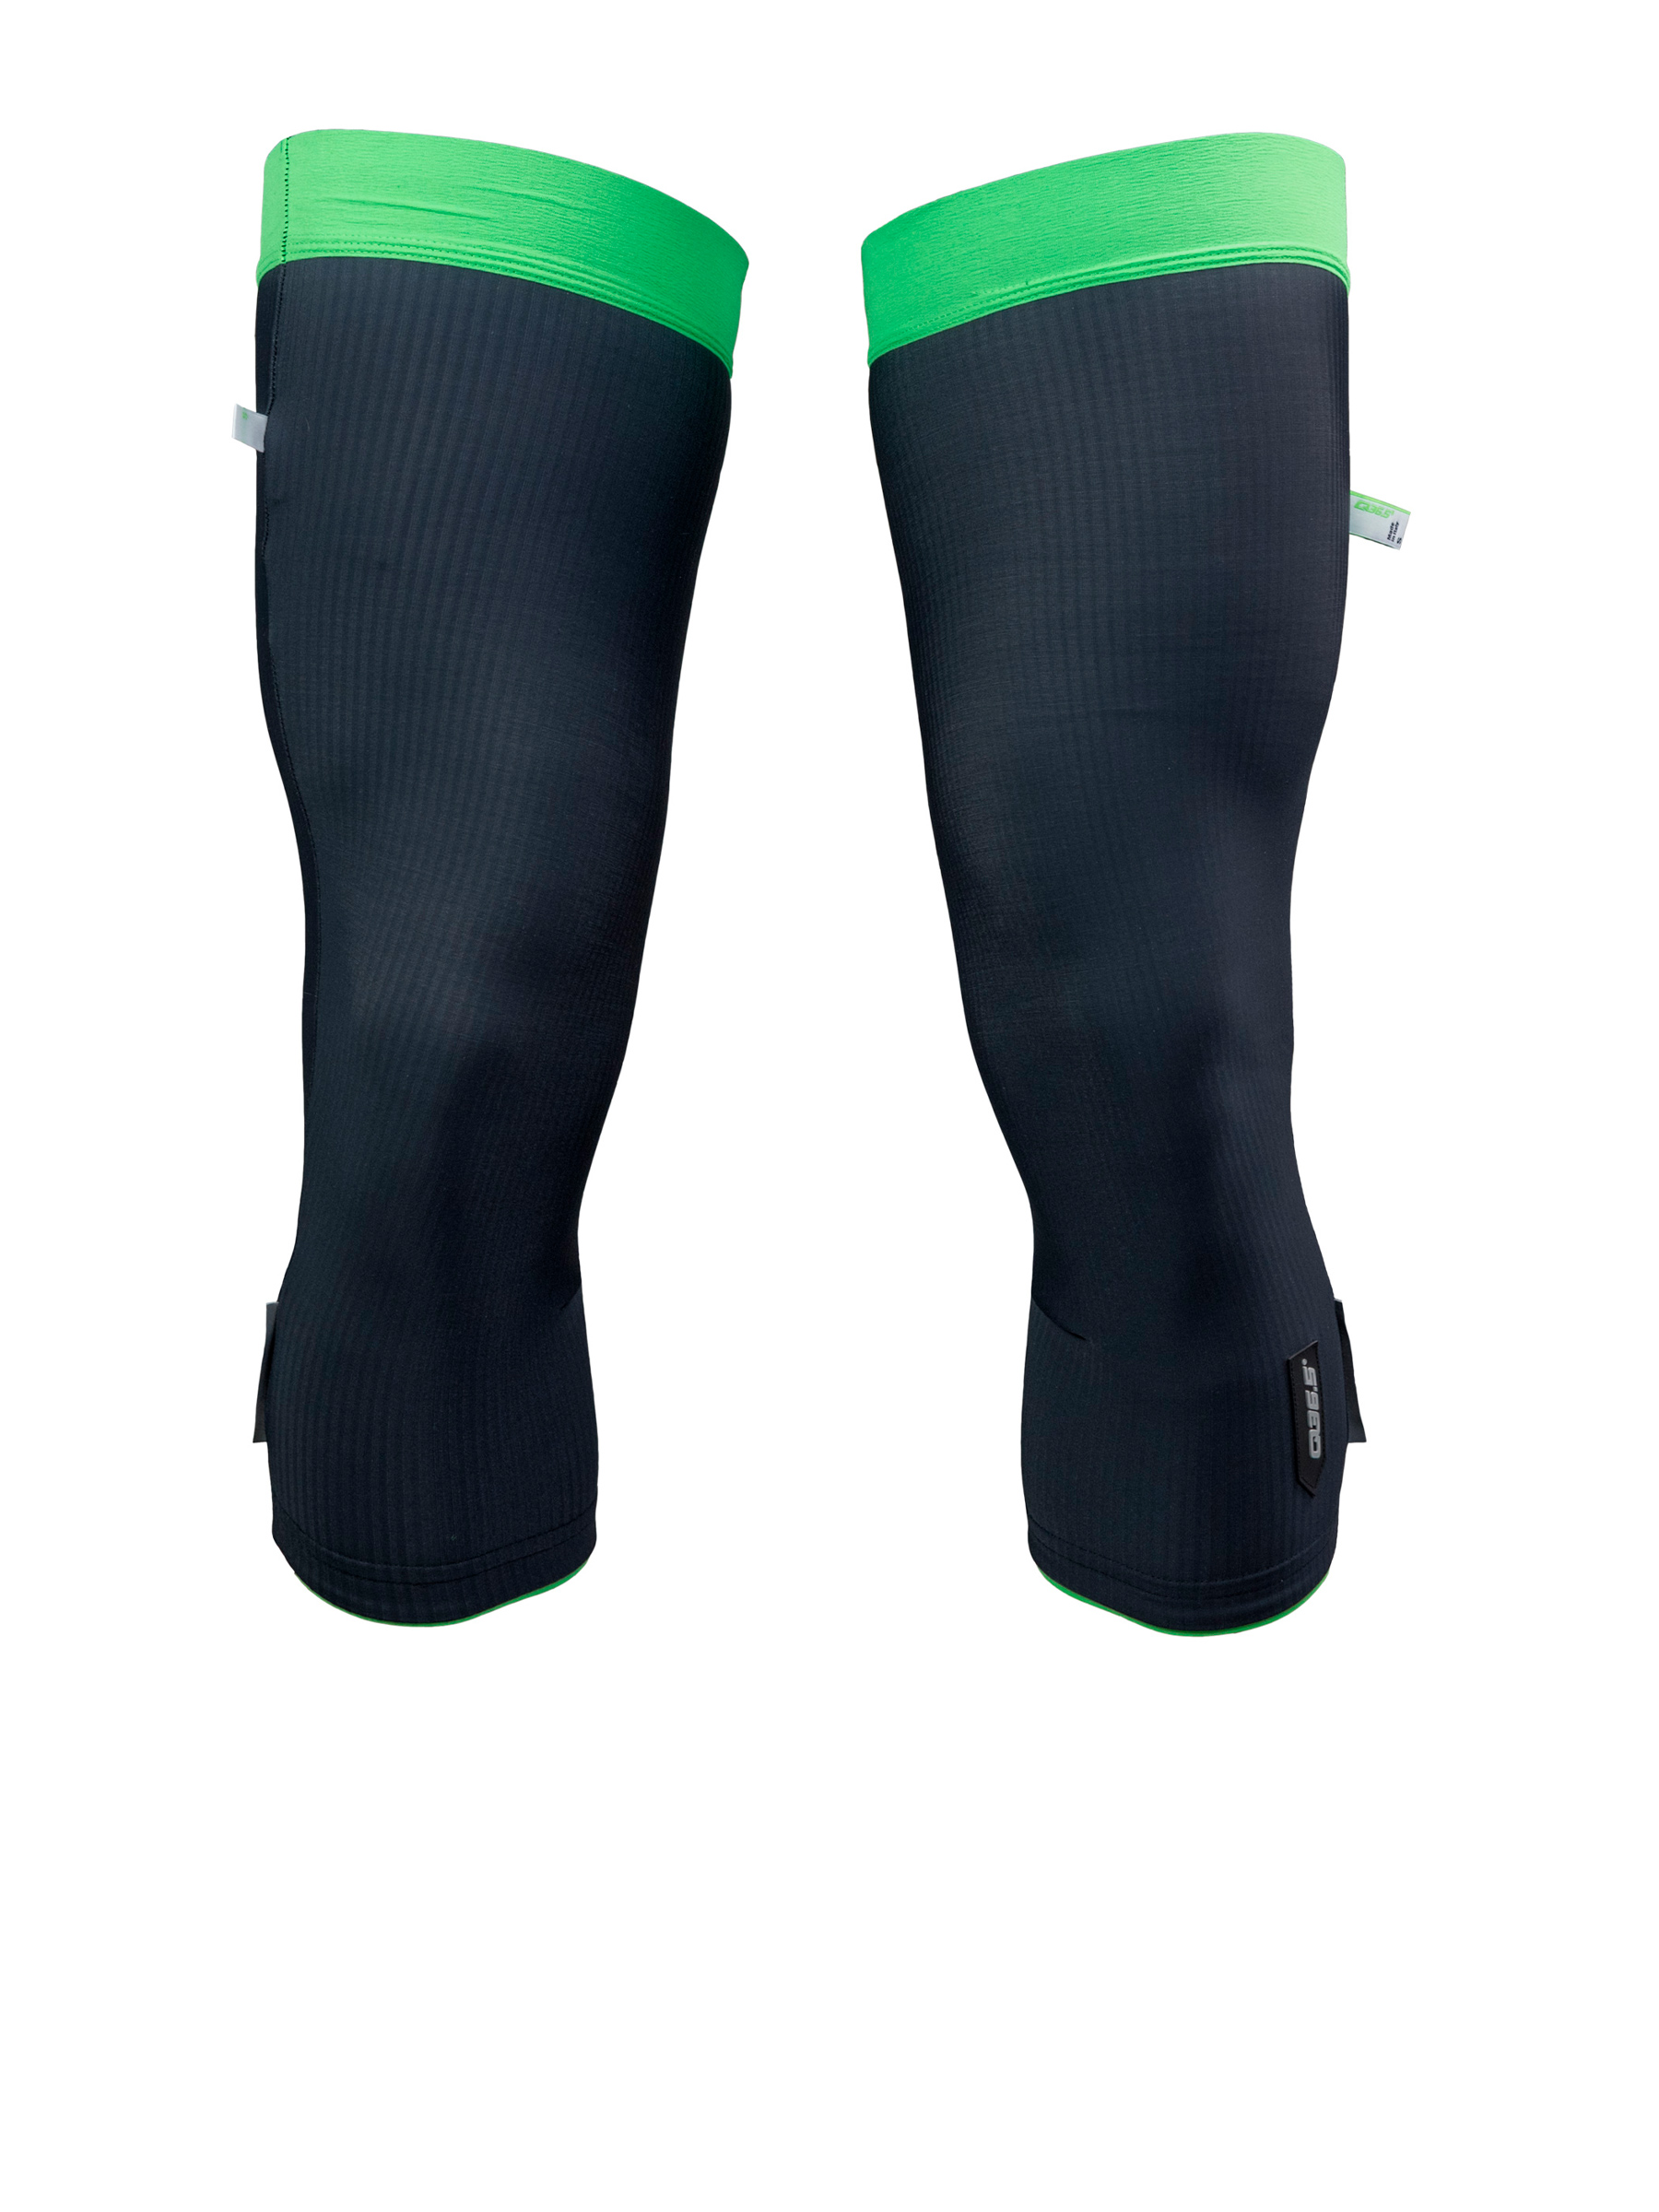 Rodilleras Pre-shape Knee Warmer